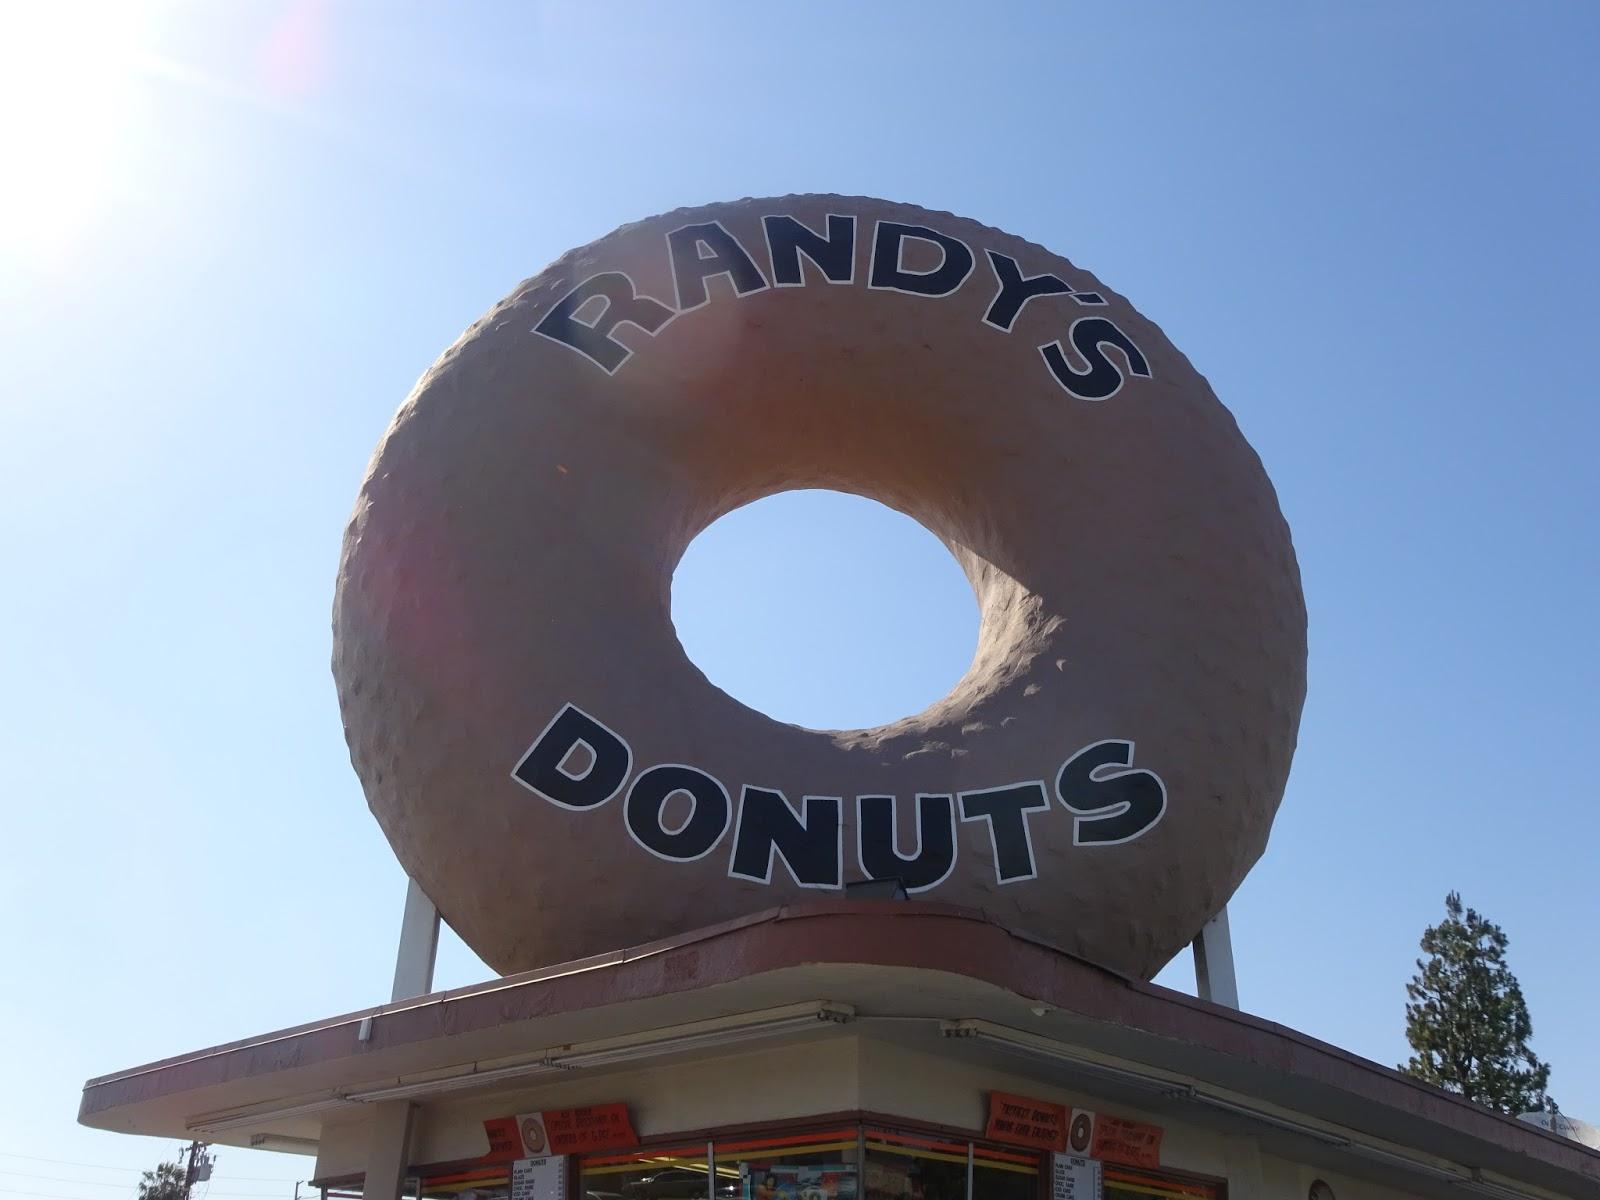 Old School Donuts Food Truck